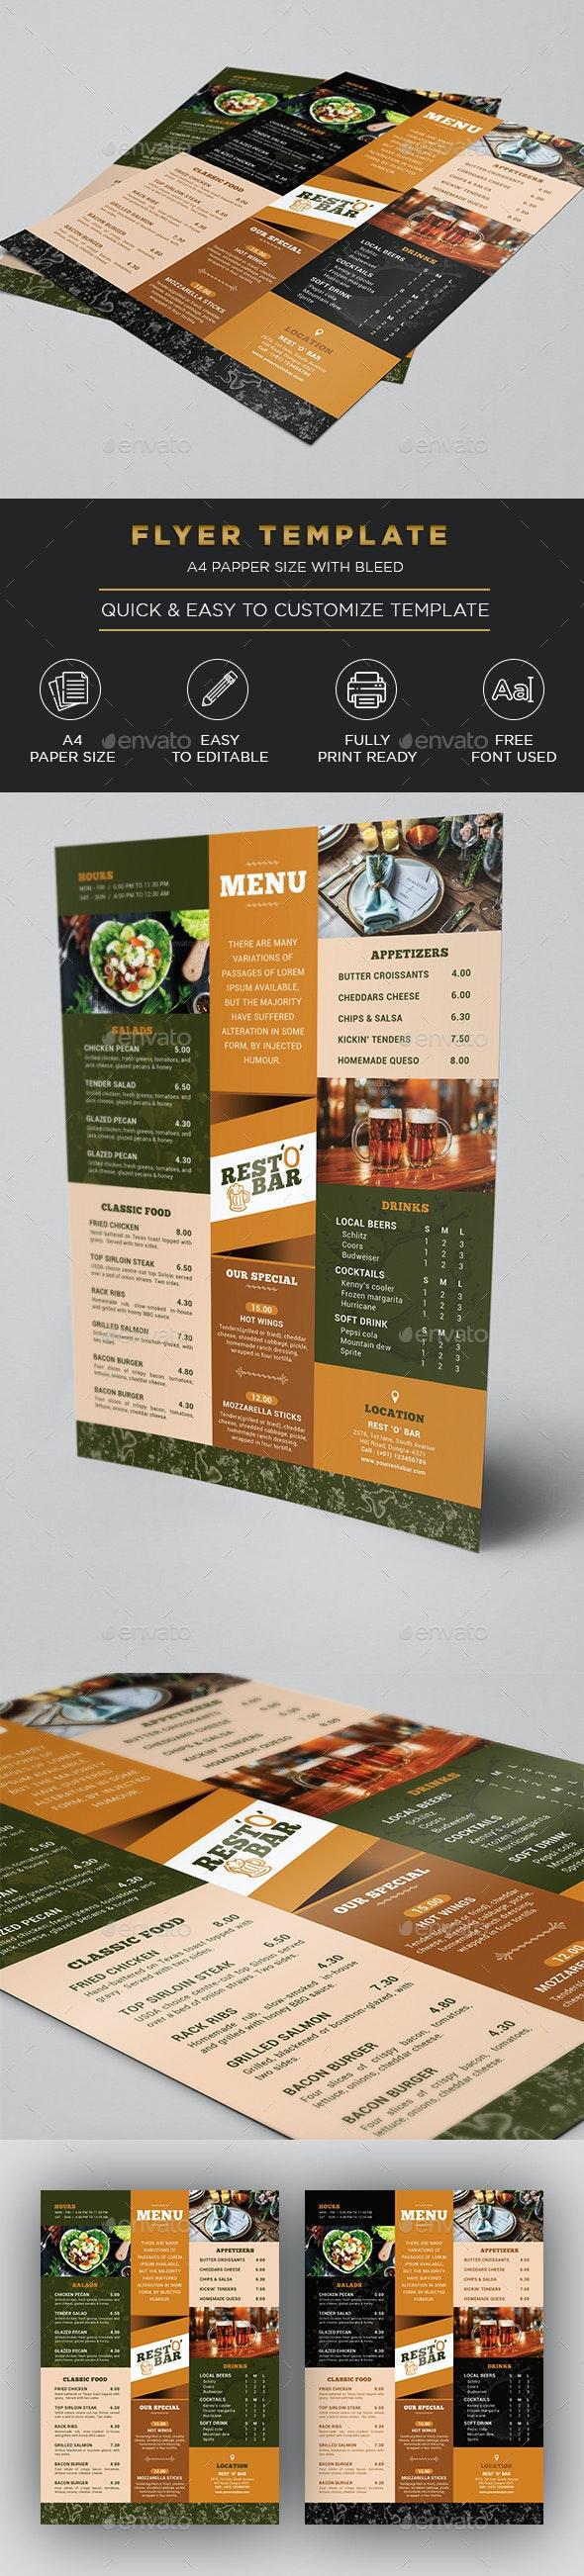 Pub and Bar Menu / Flyer - Restaurant Flyers